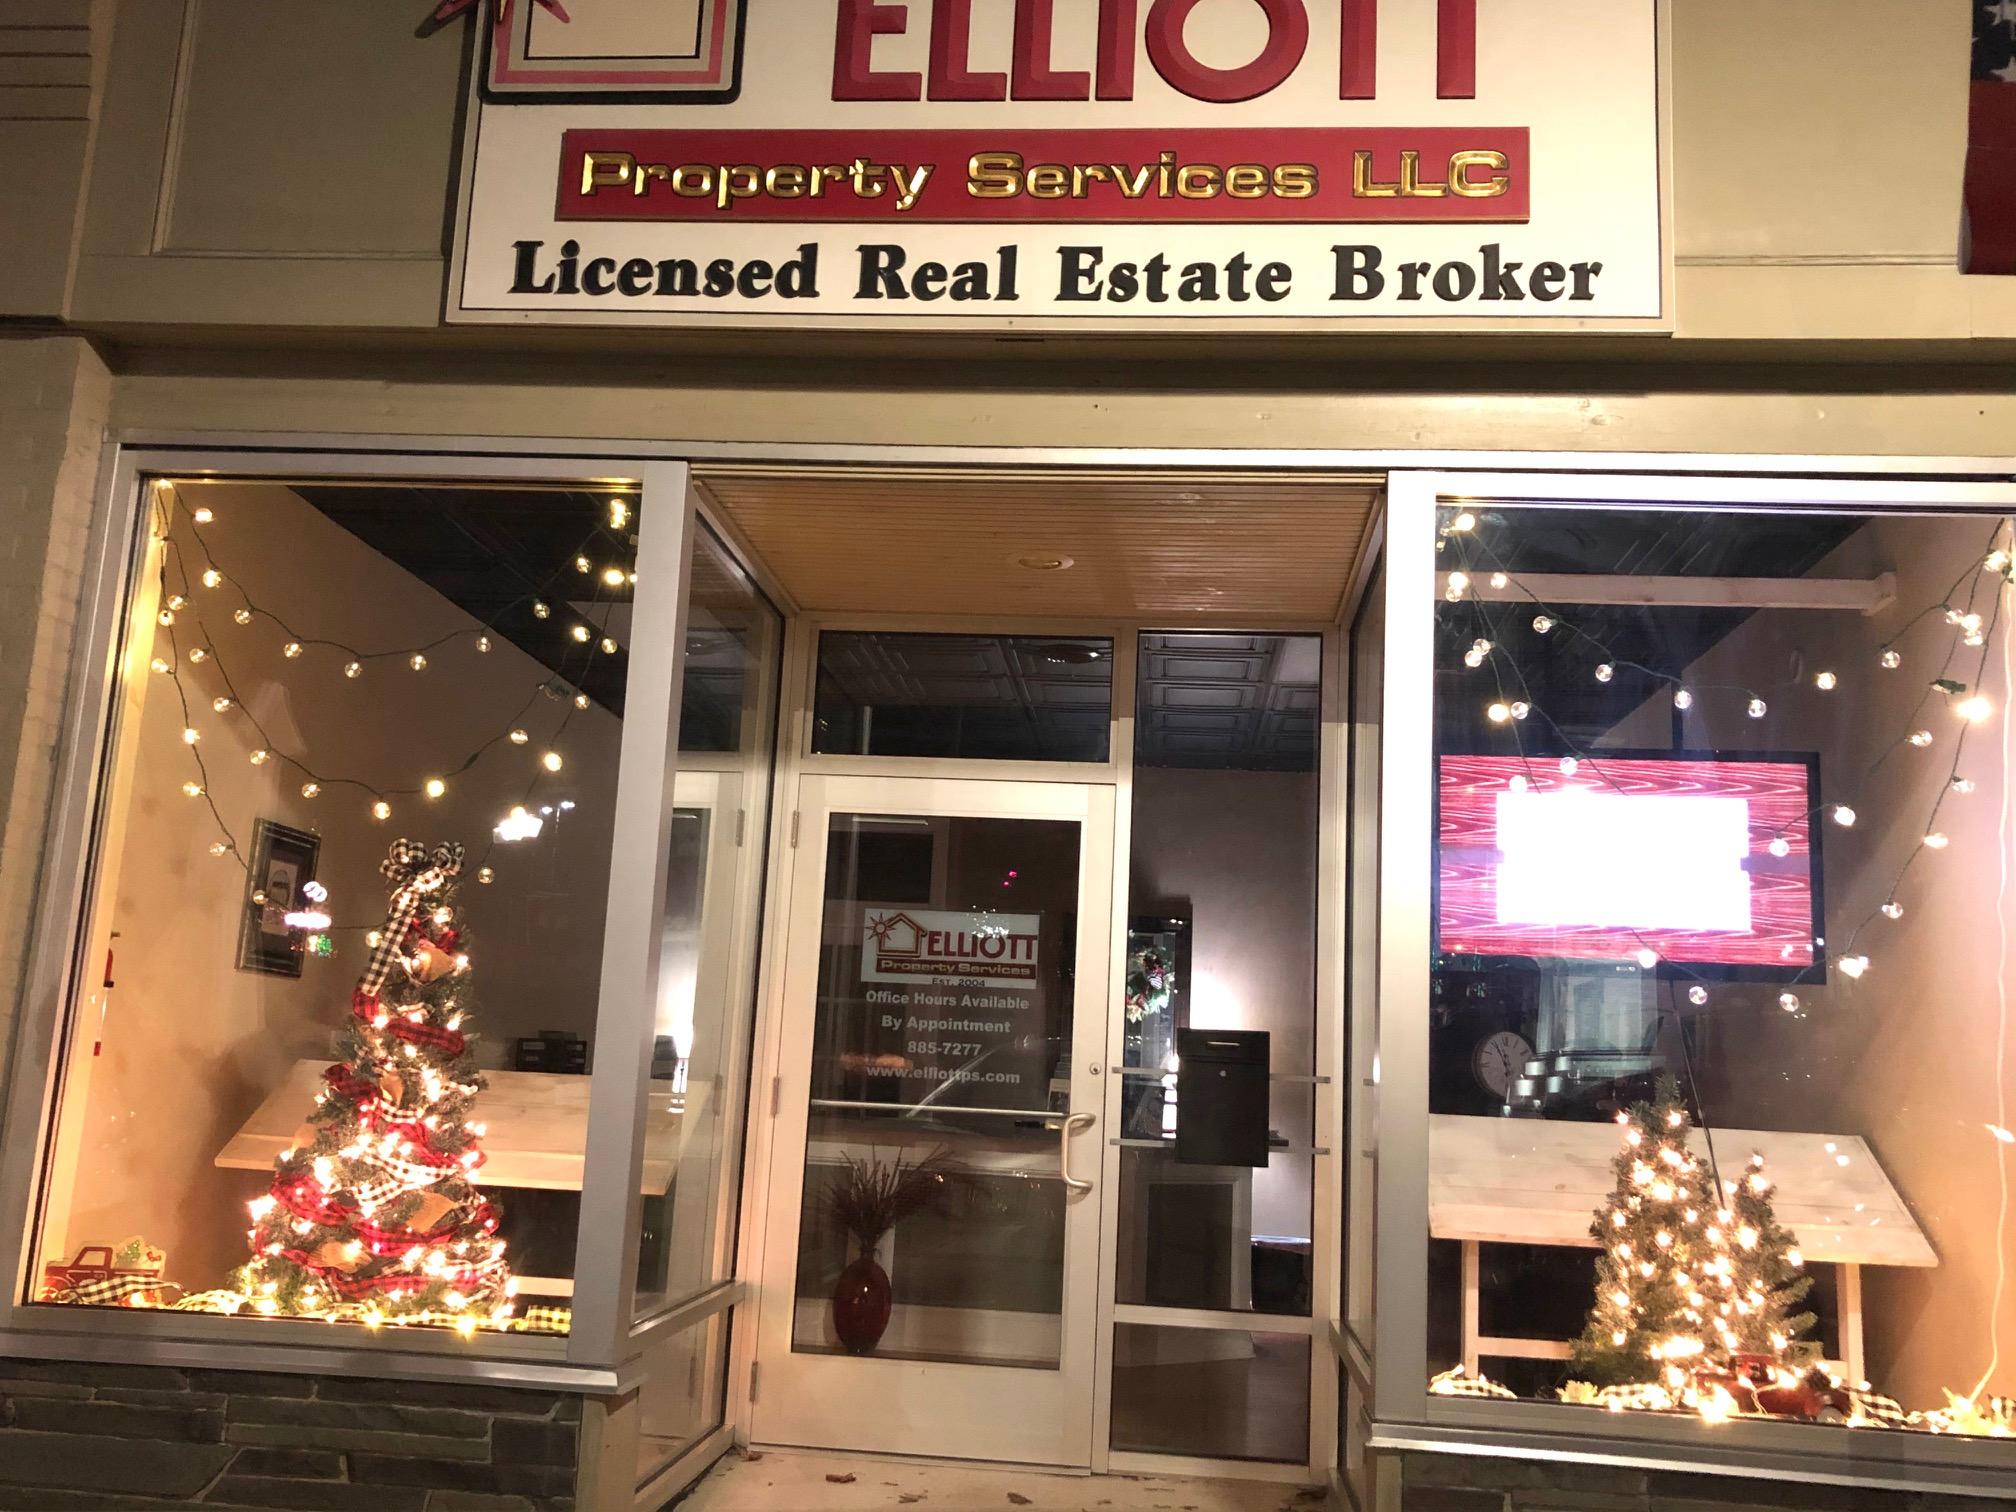 Elliott Property Services